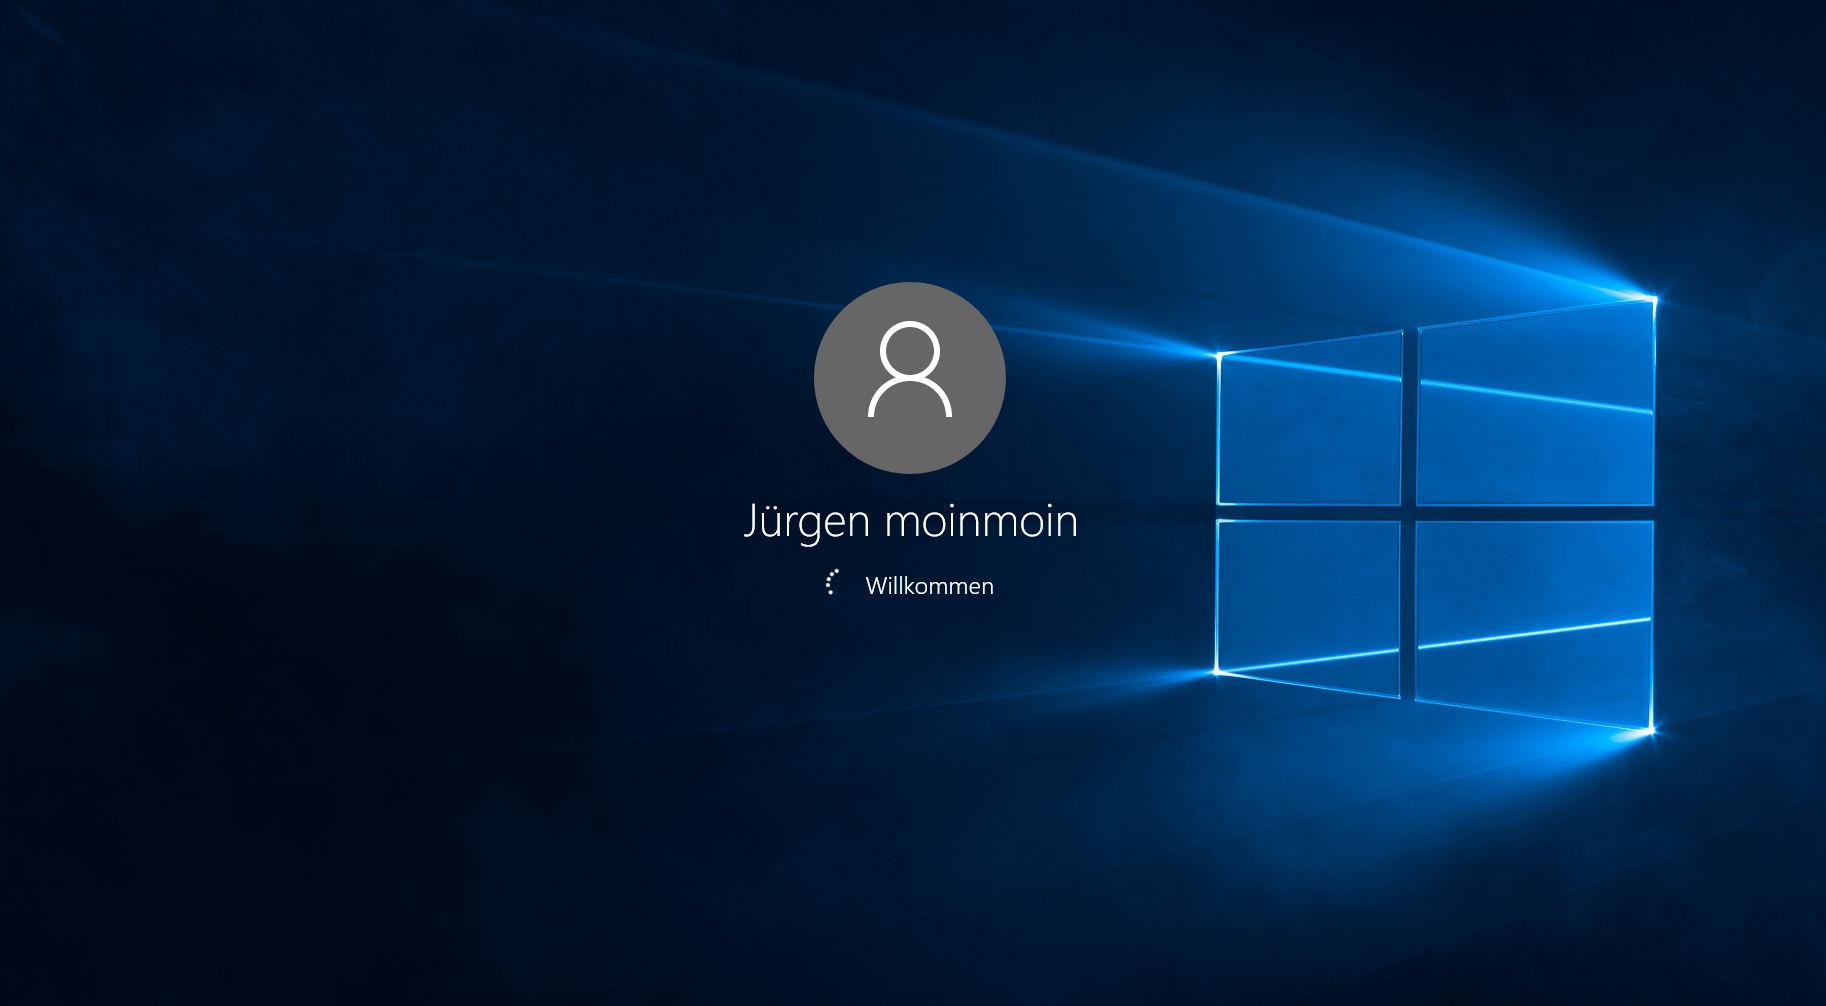 how to change login wallpaper windows 8